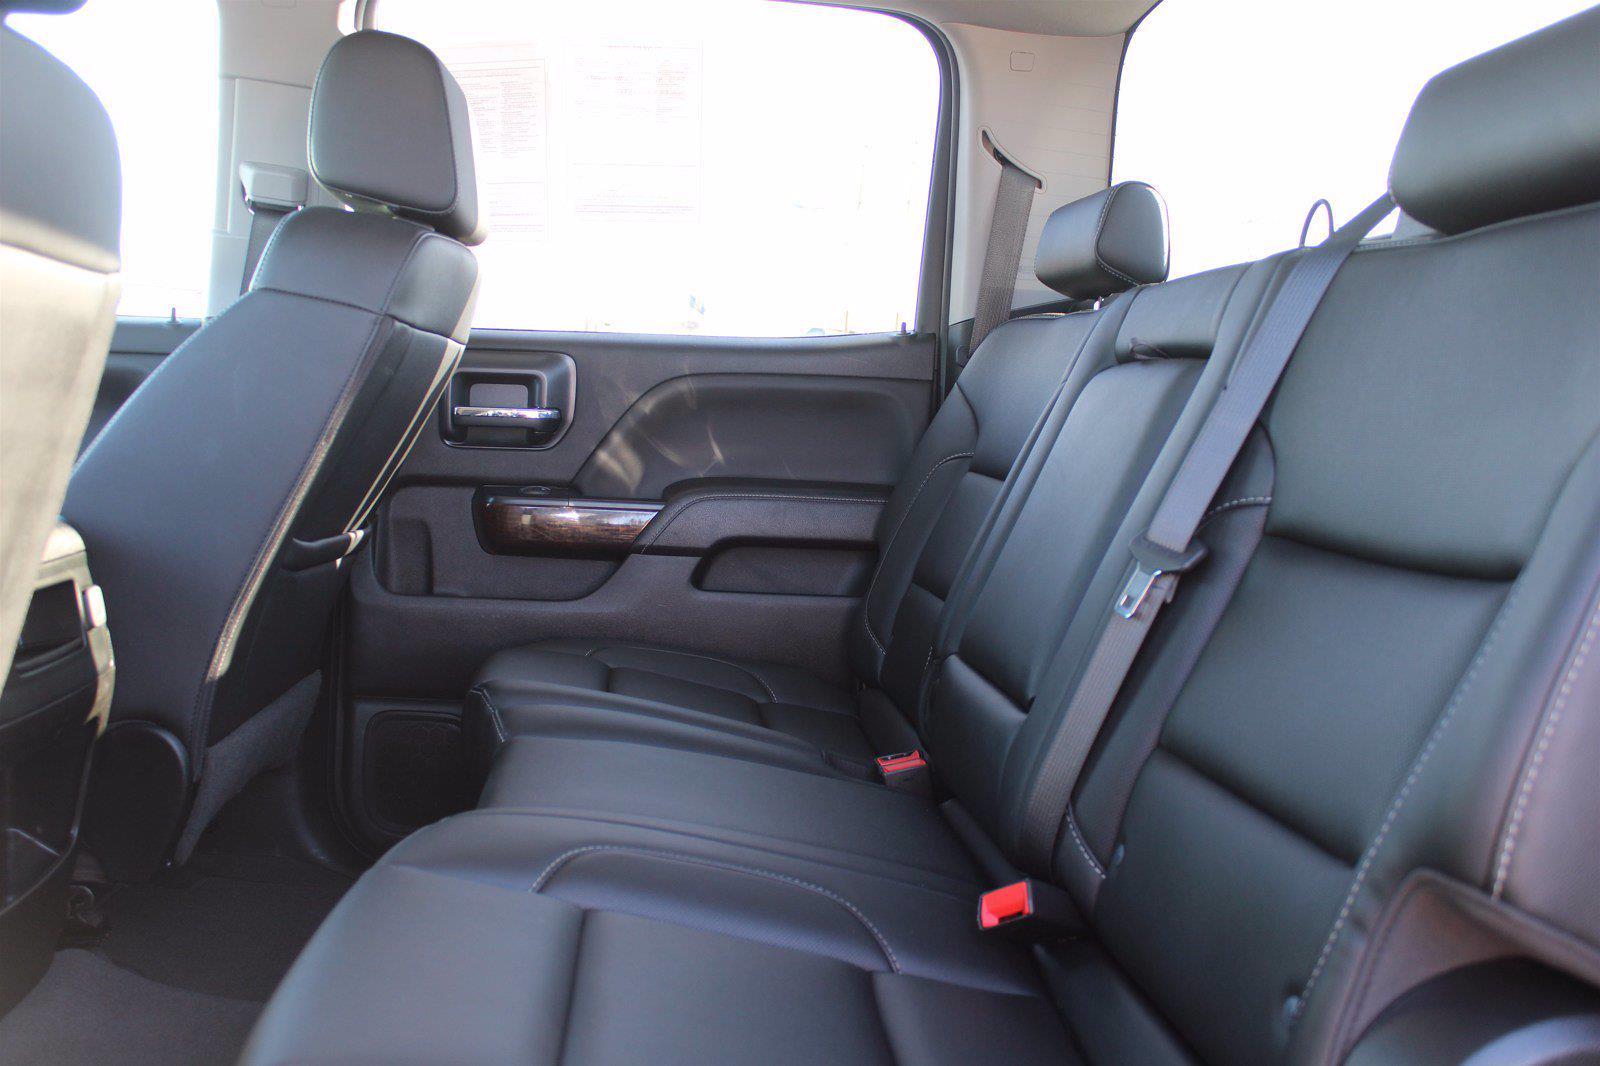 2019 GMC Sierra 3500 Crew Cab 4x4, Pickup #DAG0047 - photo 7